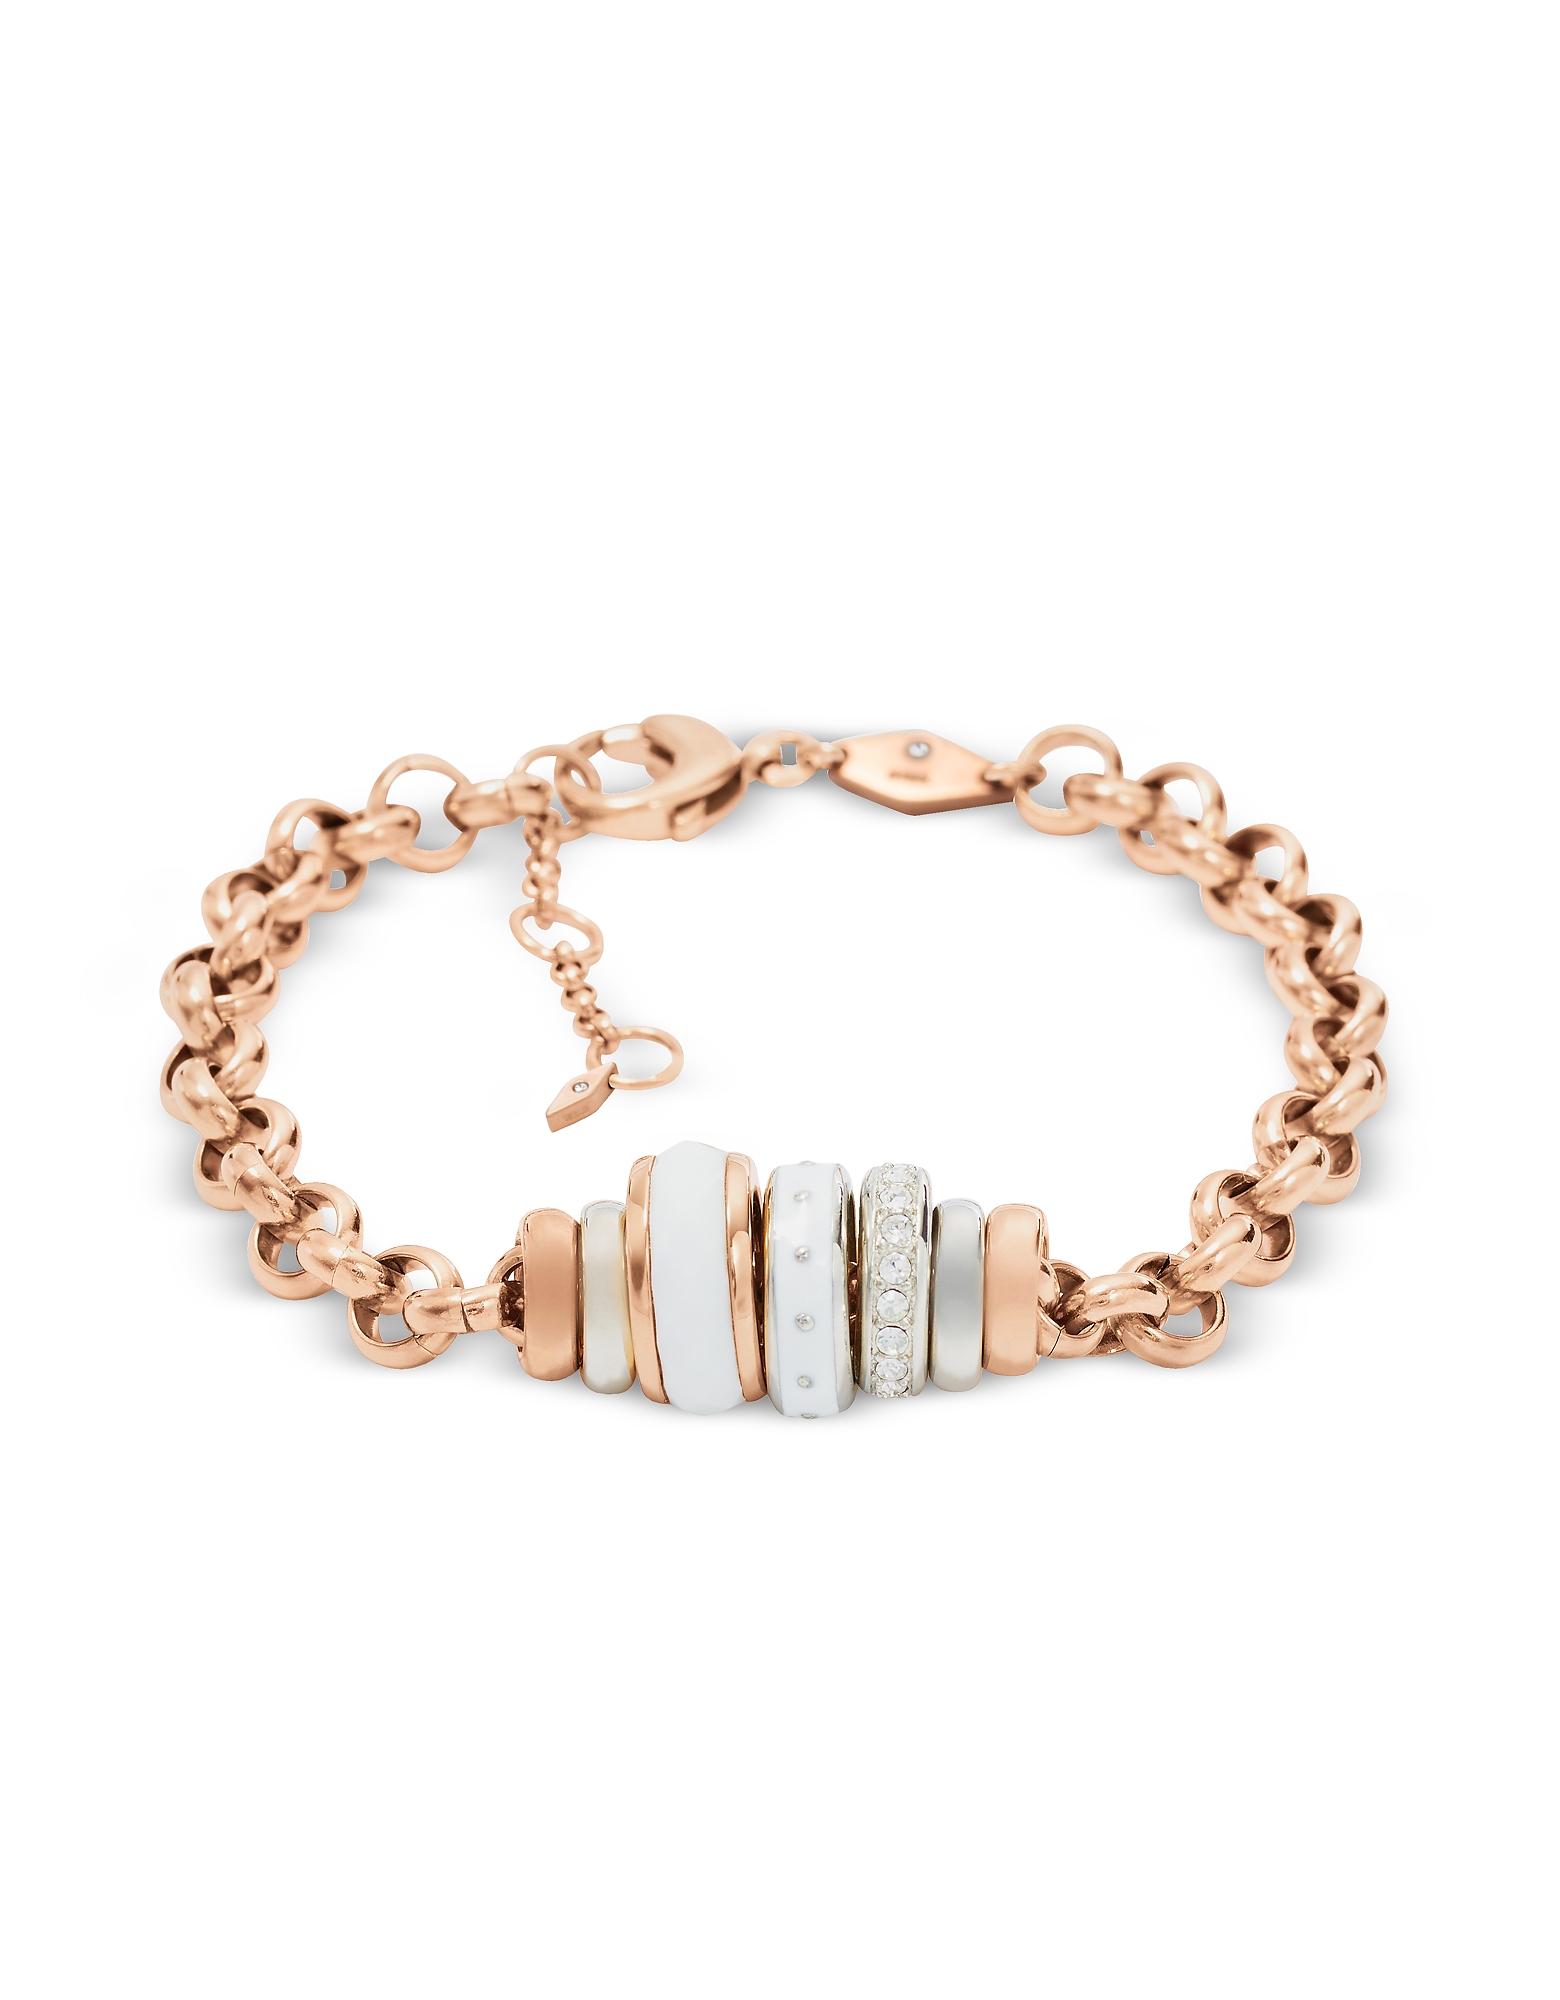 Fossil Bracelets, Classics Rose Gold Women's Bracelet